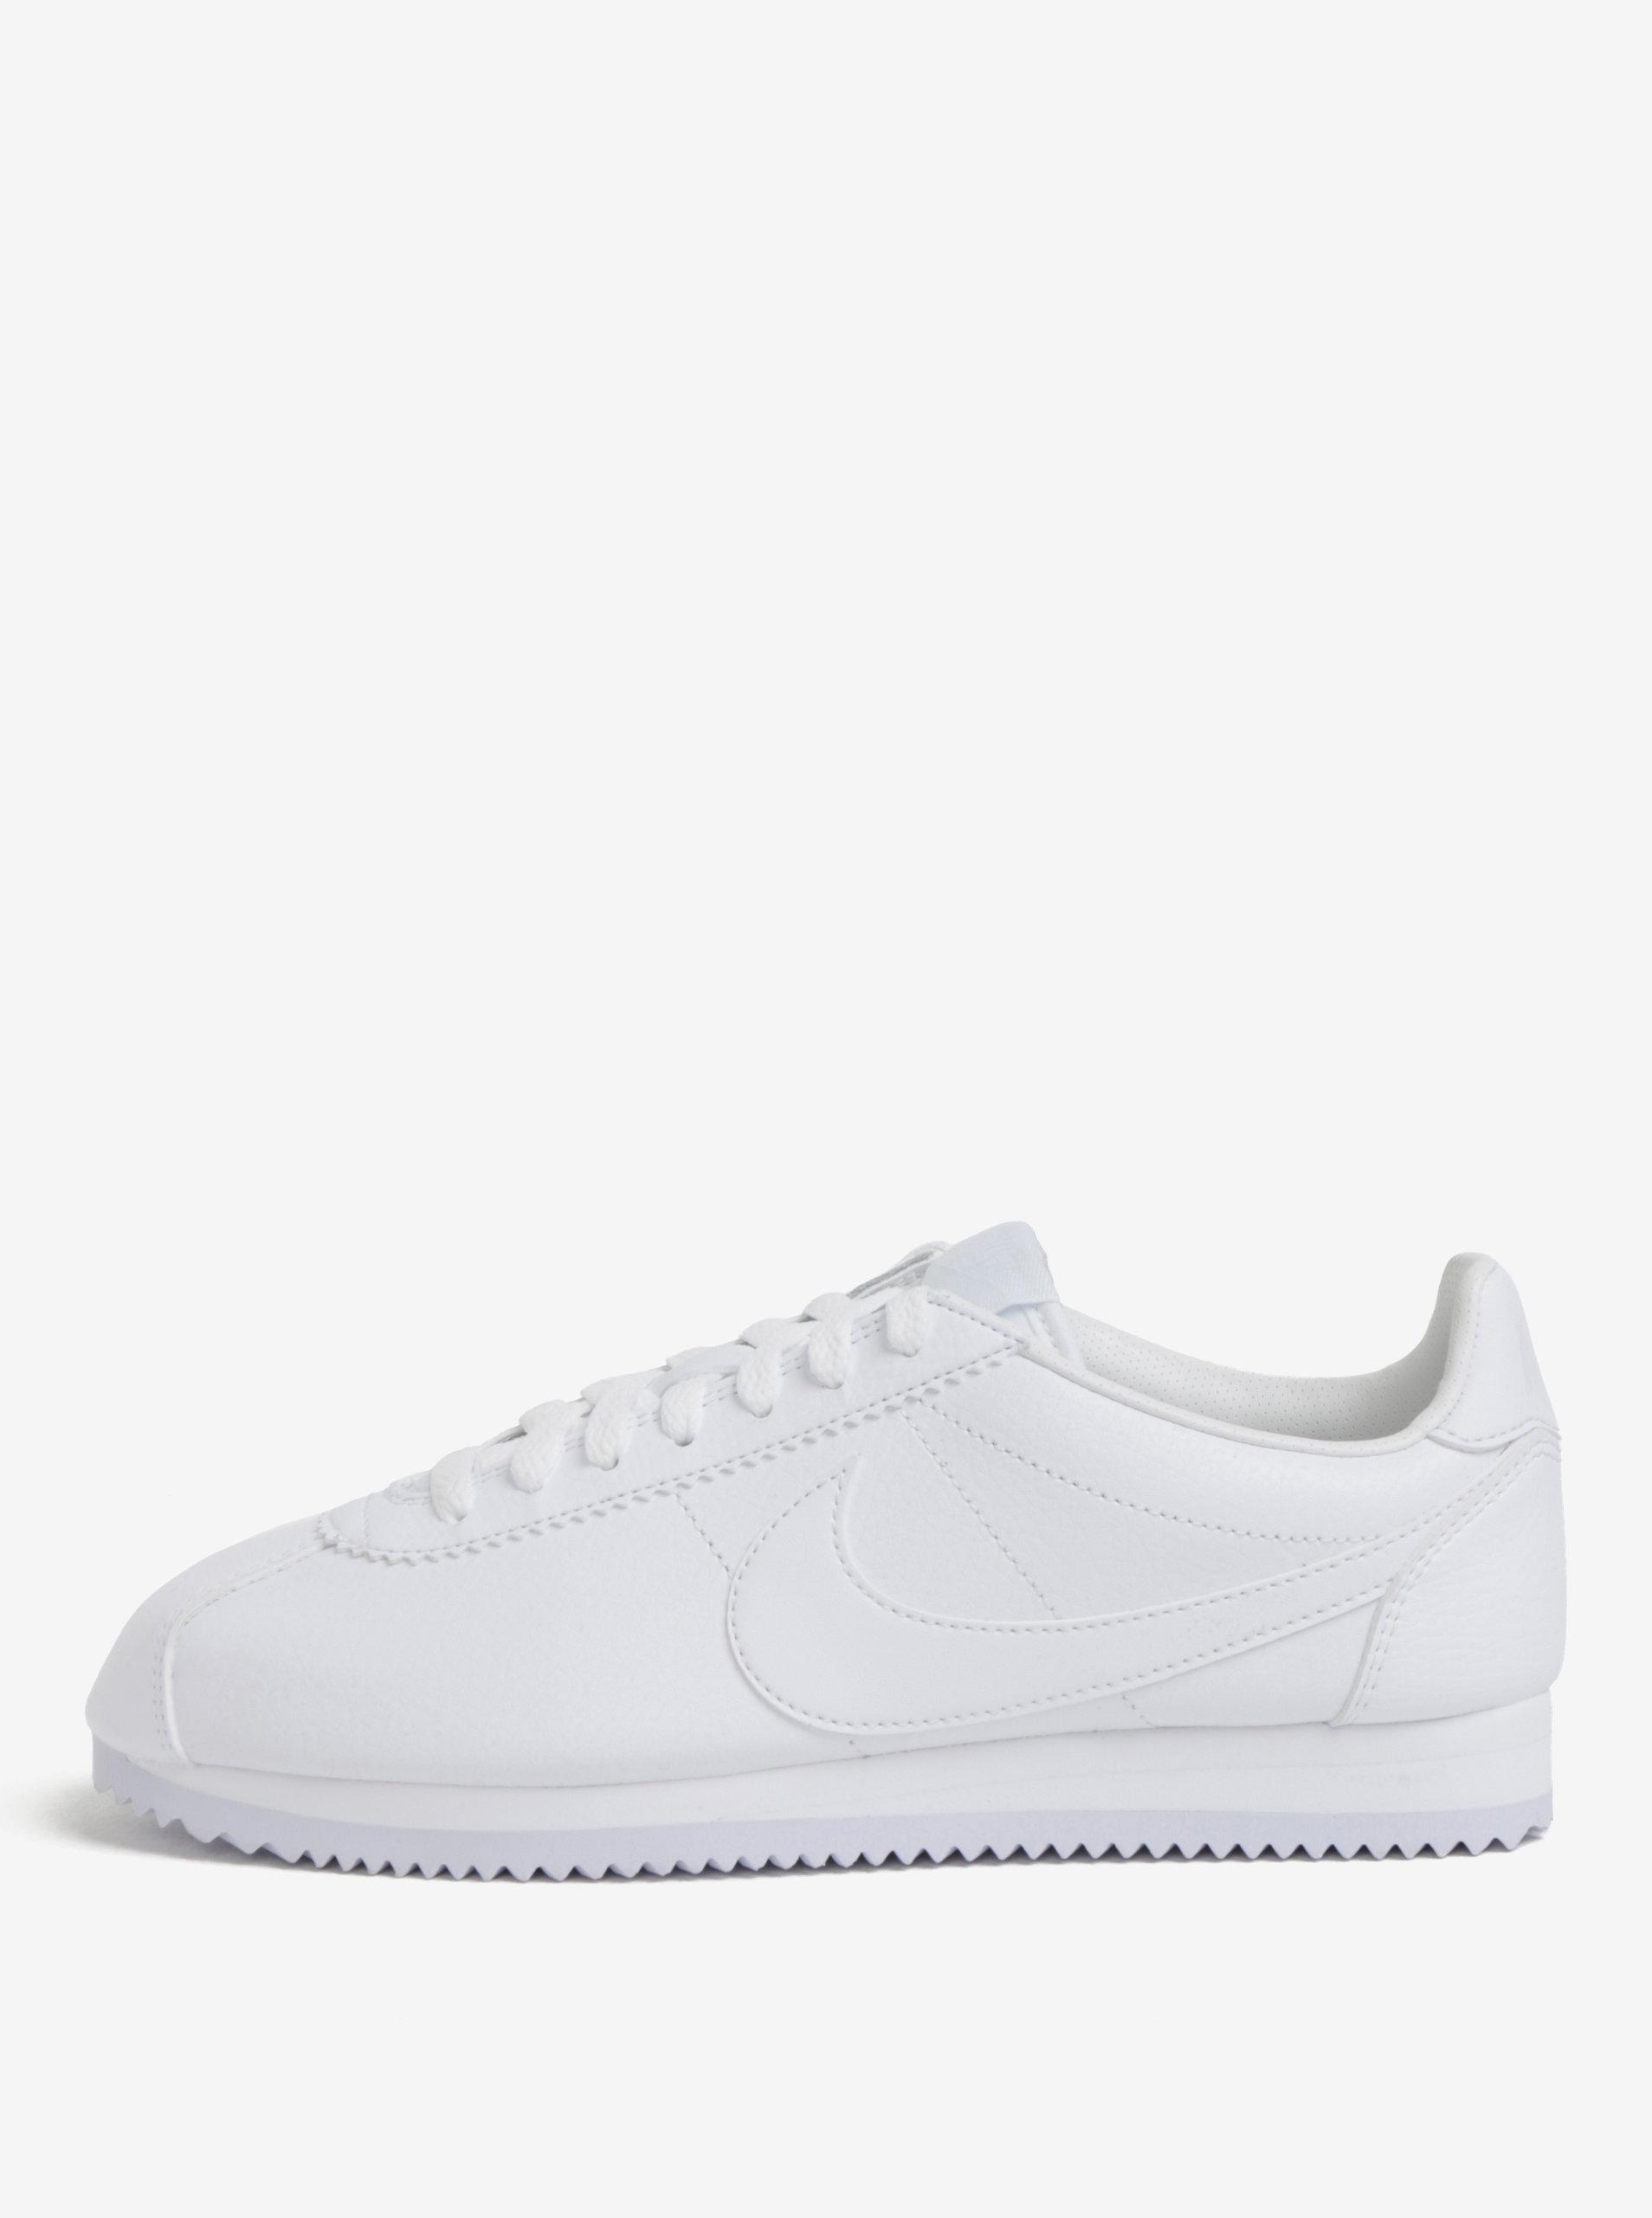 Bílé pánské kožené tenisky Nike Classic Cortez ... 254f606e76e